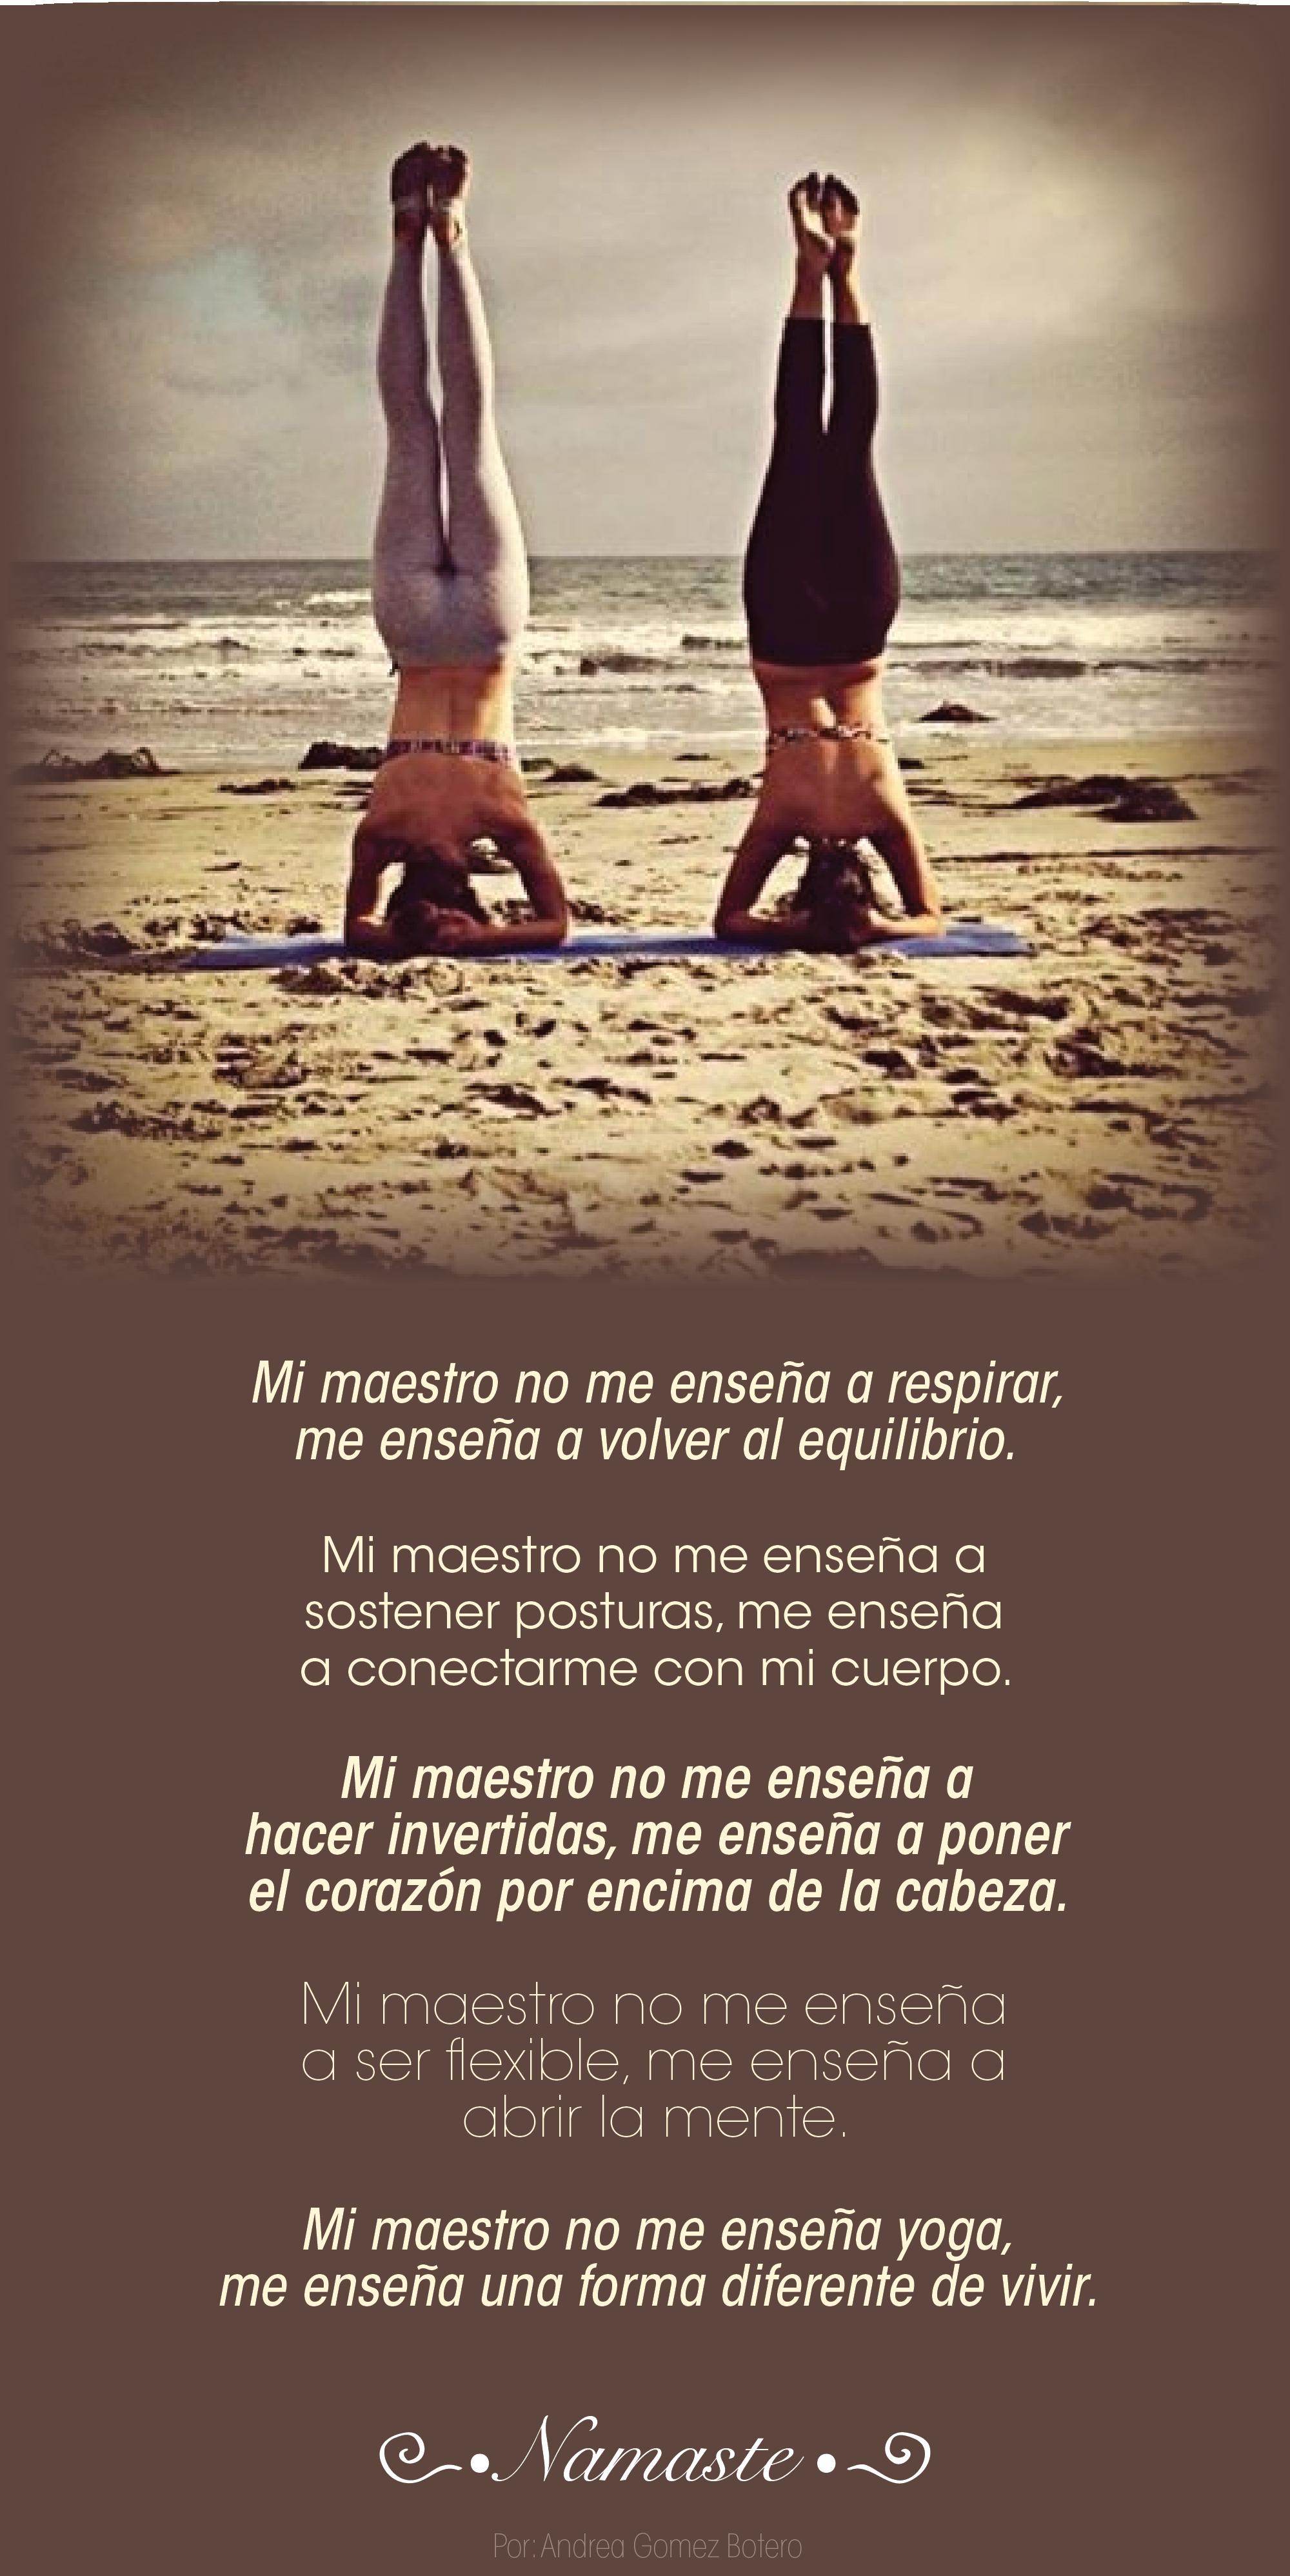 Yoga Maestro Corazón Cabeza Amor Autoestima Fuerza Yoga Outdoor Beach